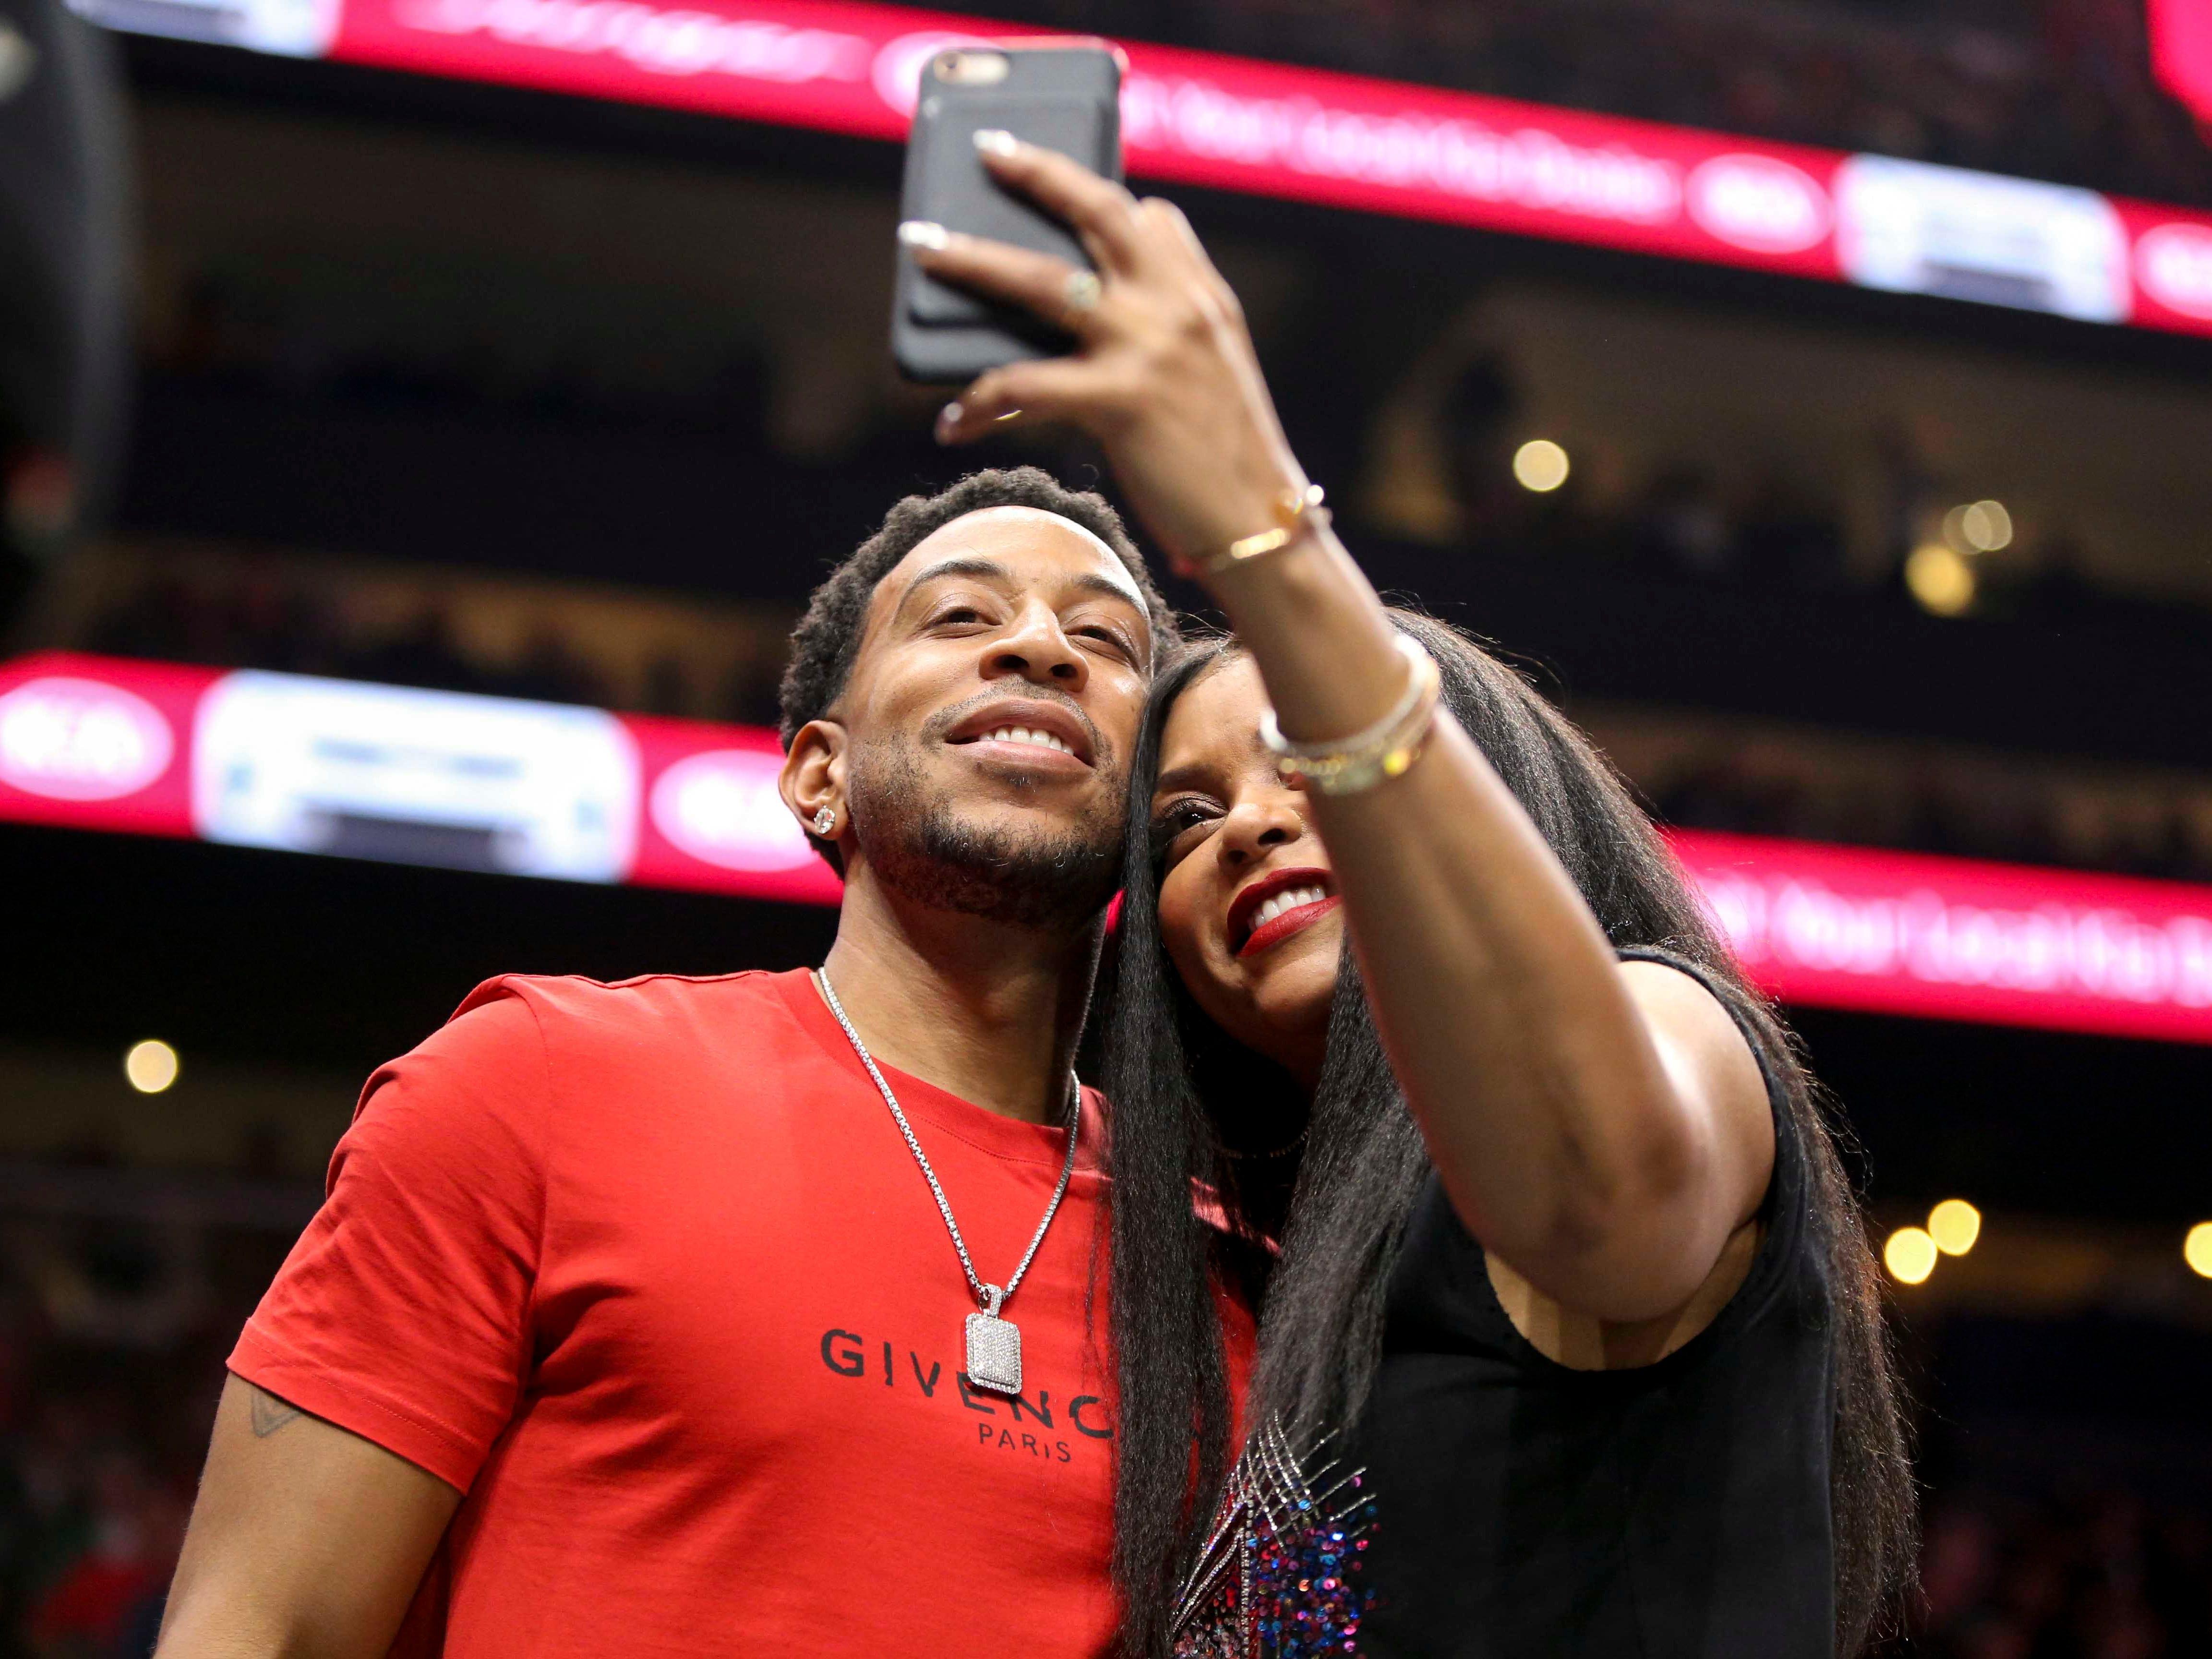 Jan. 19: Taraji P. Henson and Ludacris snap a quick selfie at the Hawks-Celtics game in Atlanta.